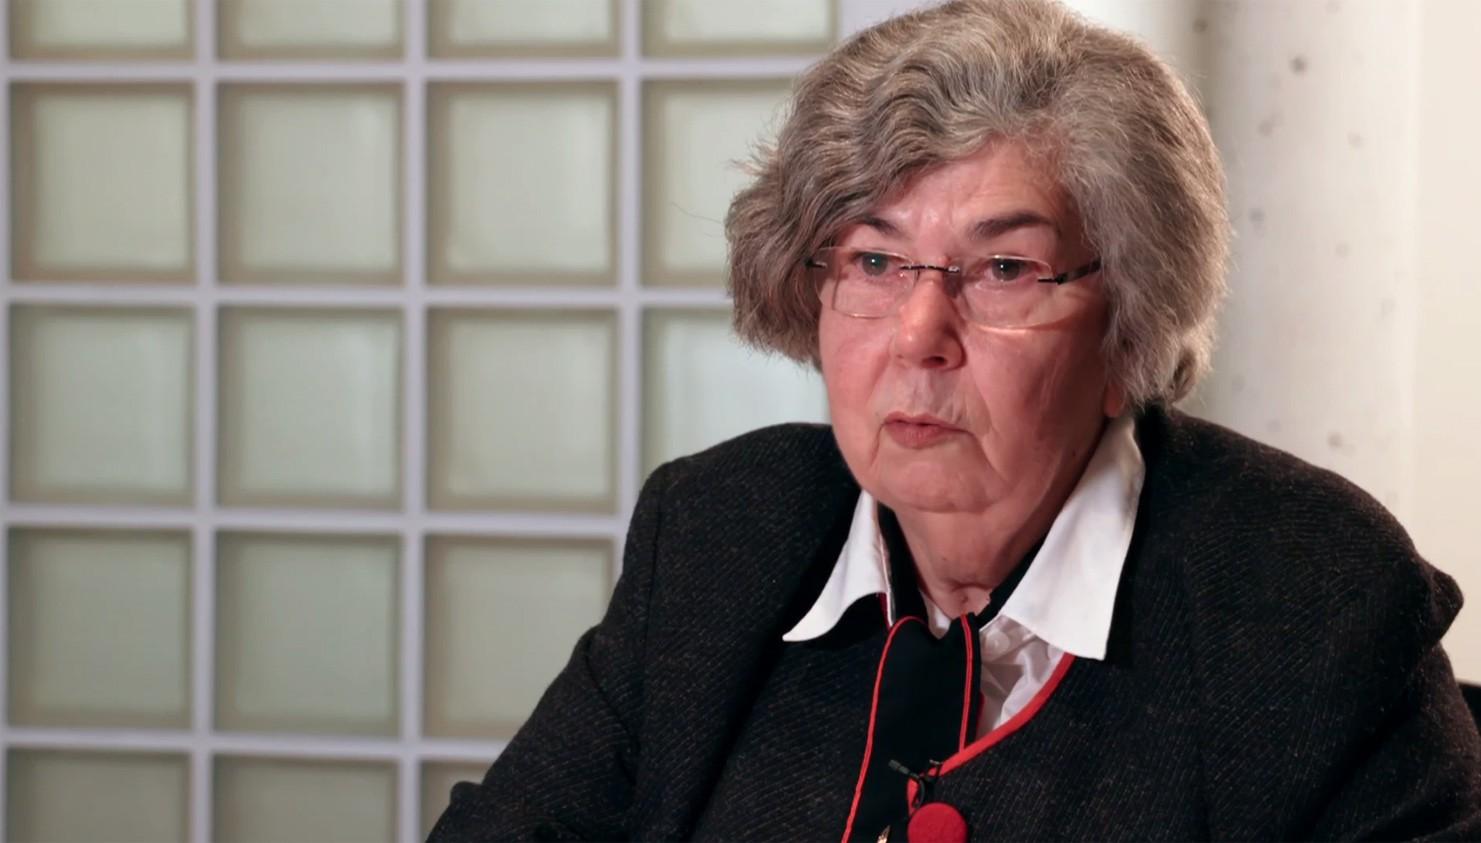 Dr. Christa Schmidt (2015). Quelle: Bundesstiftung Aufarbeitung